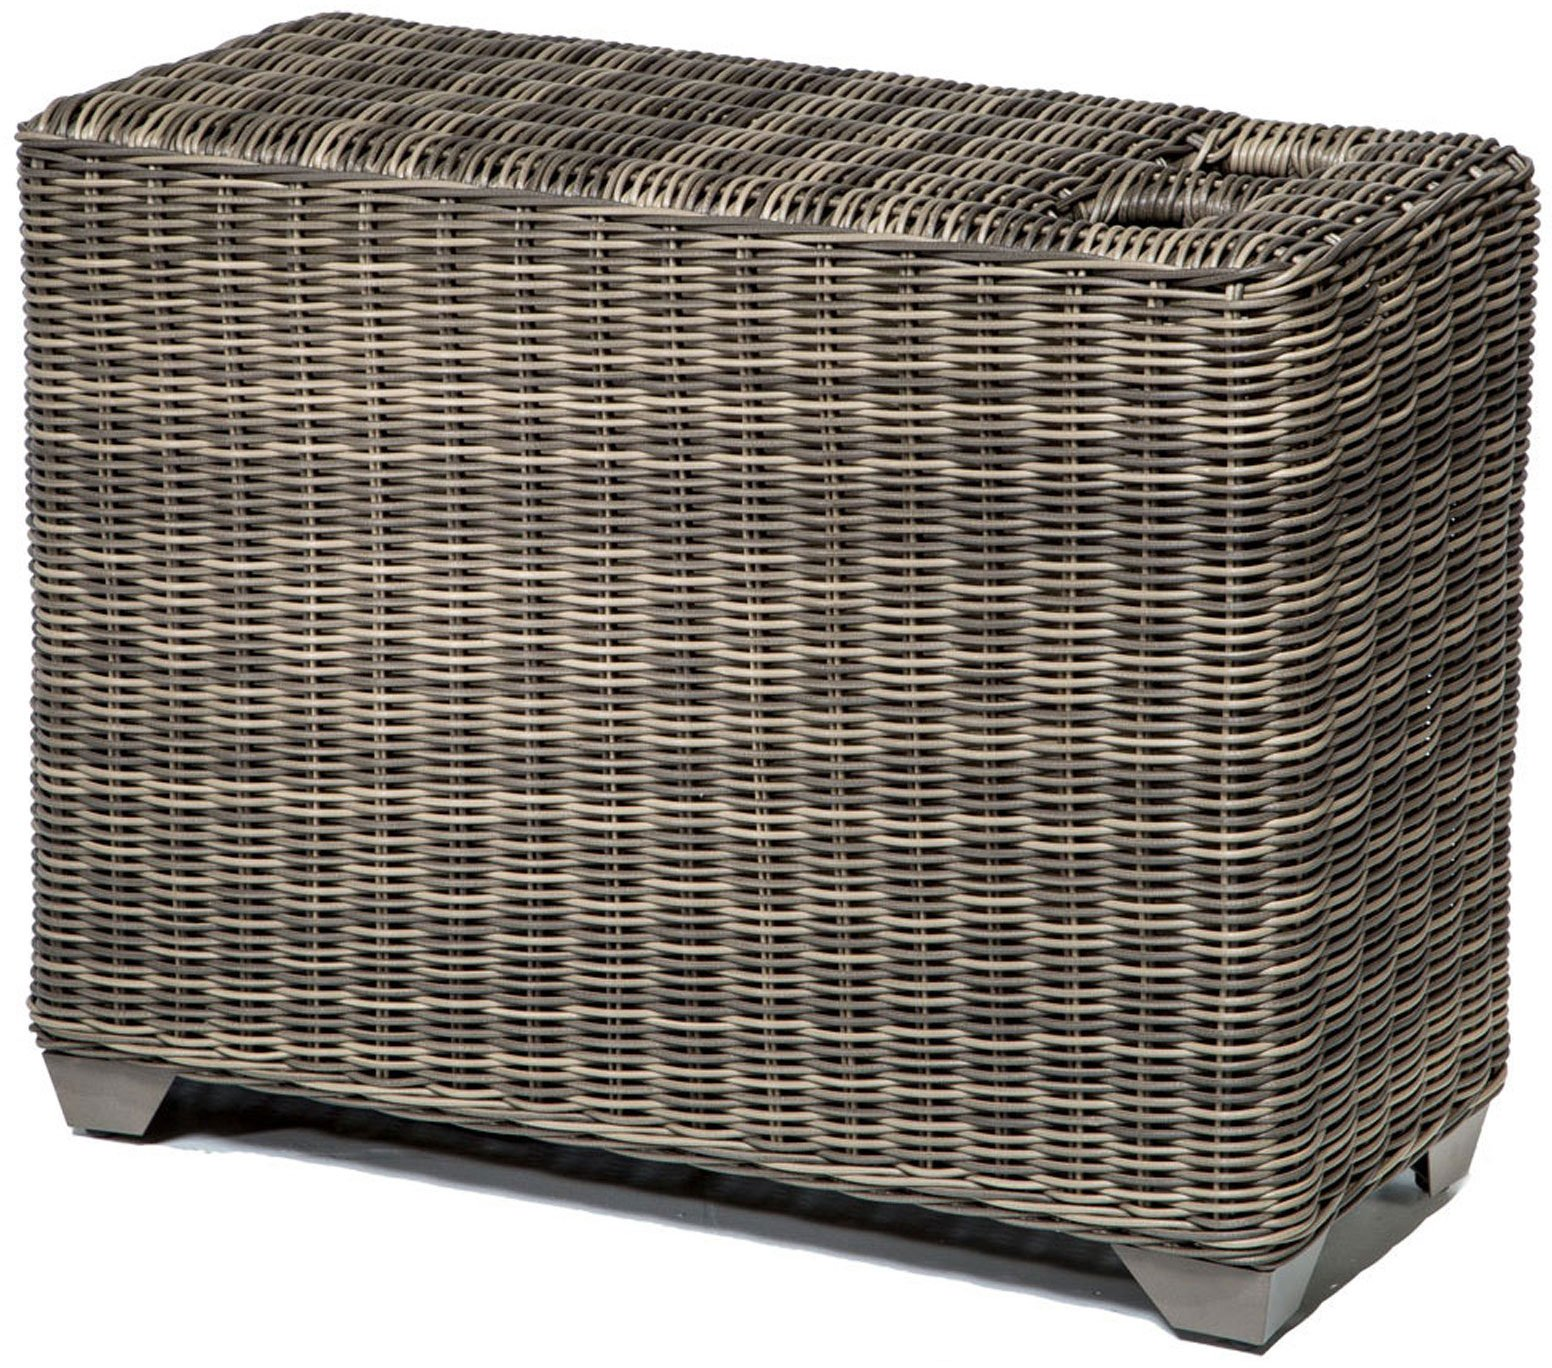 Outdoor Furniture -  -  - 812O%2B9kVEZL -